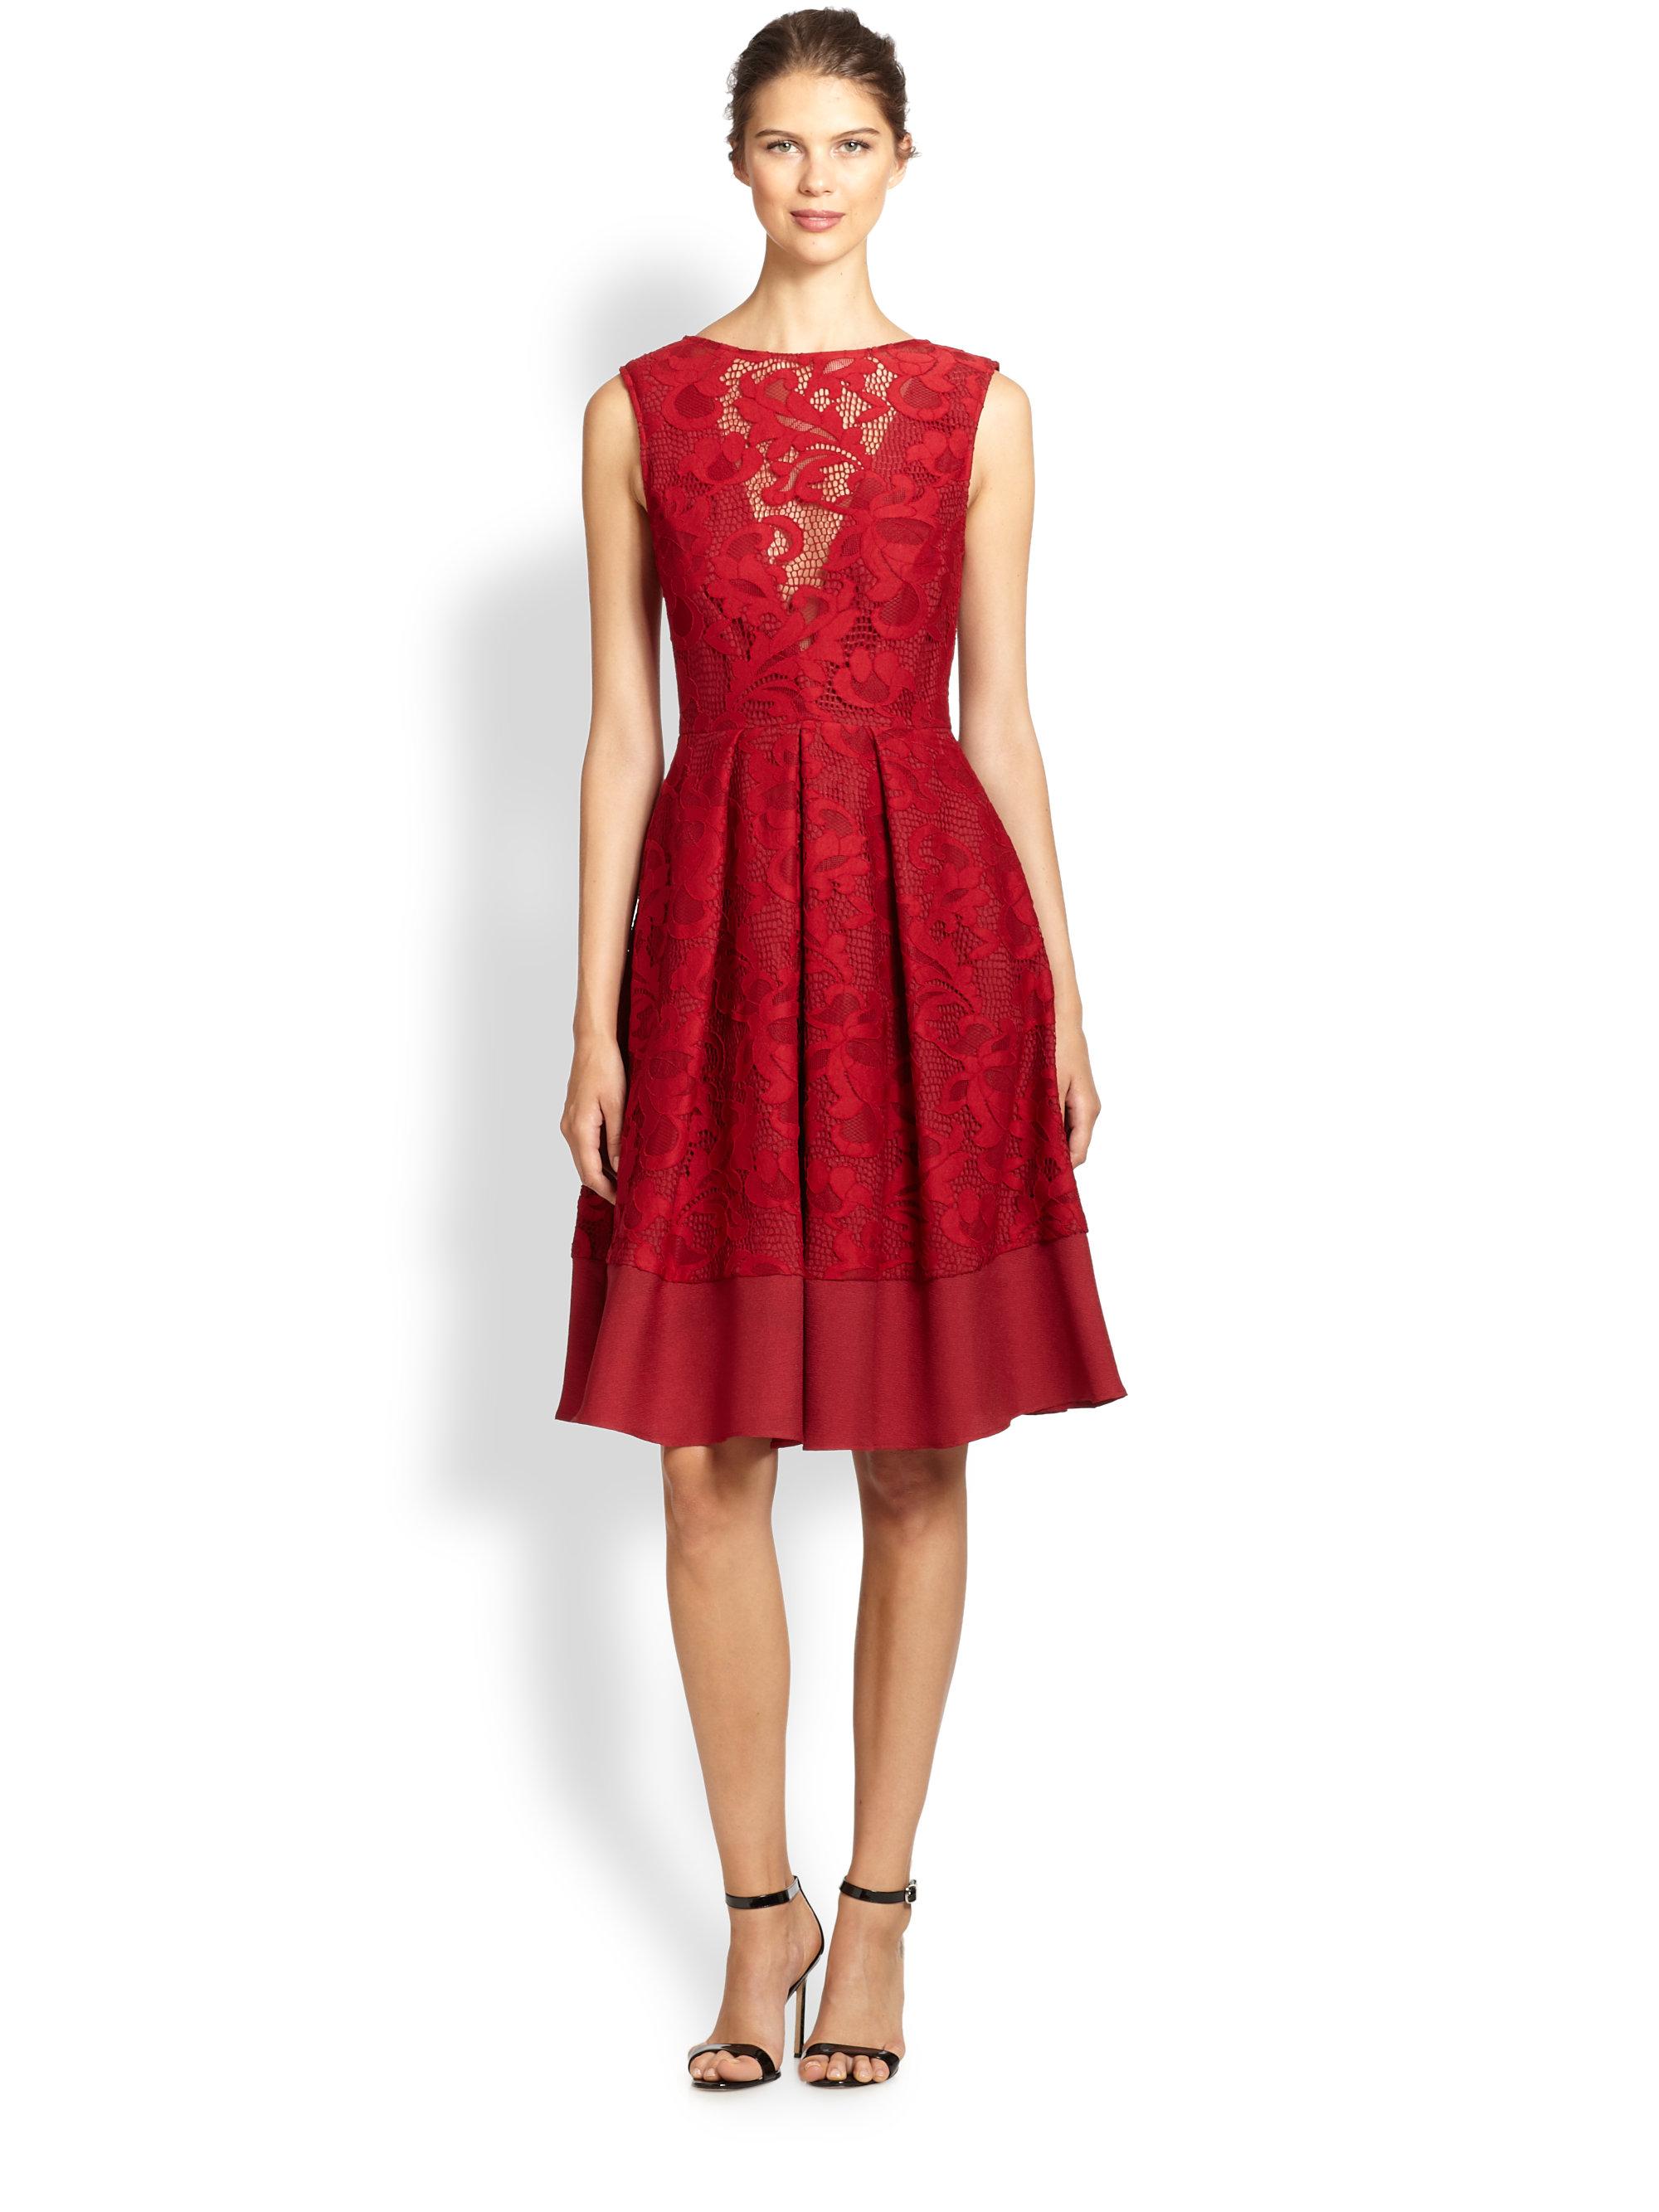 2d90fd6b67f29 ... Stretch Crepe Scuba. Abs Allen Schwartz Women S Ed Dress With Choker  Neckline In. Gallery. Lyst Abs By Allen Schwartz Flared Lace Overlay Dress  In Red